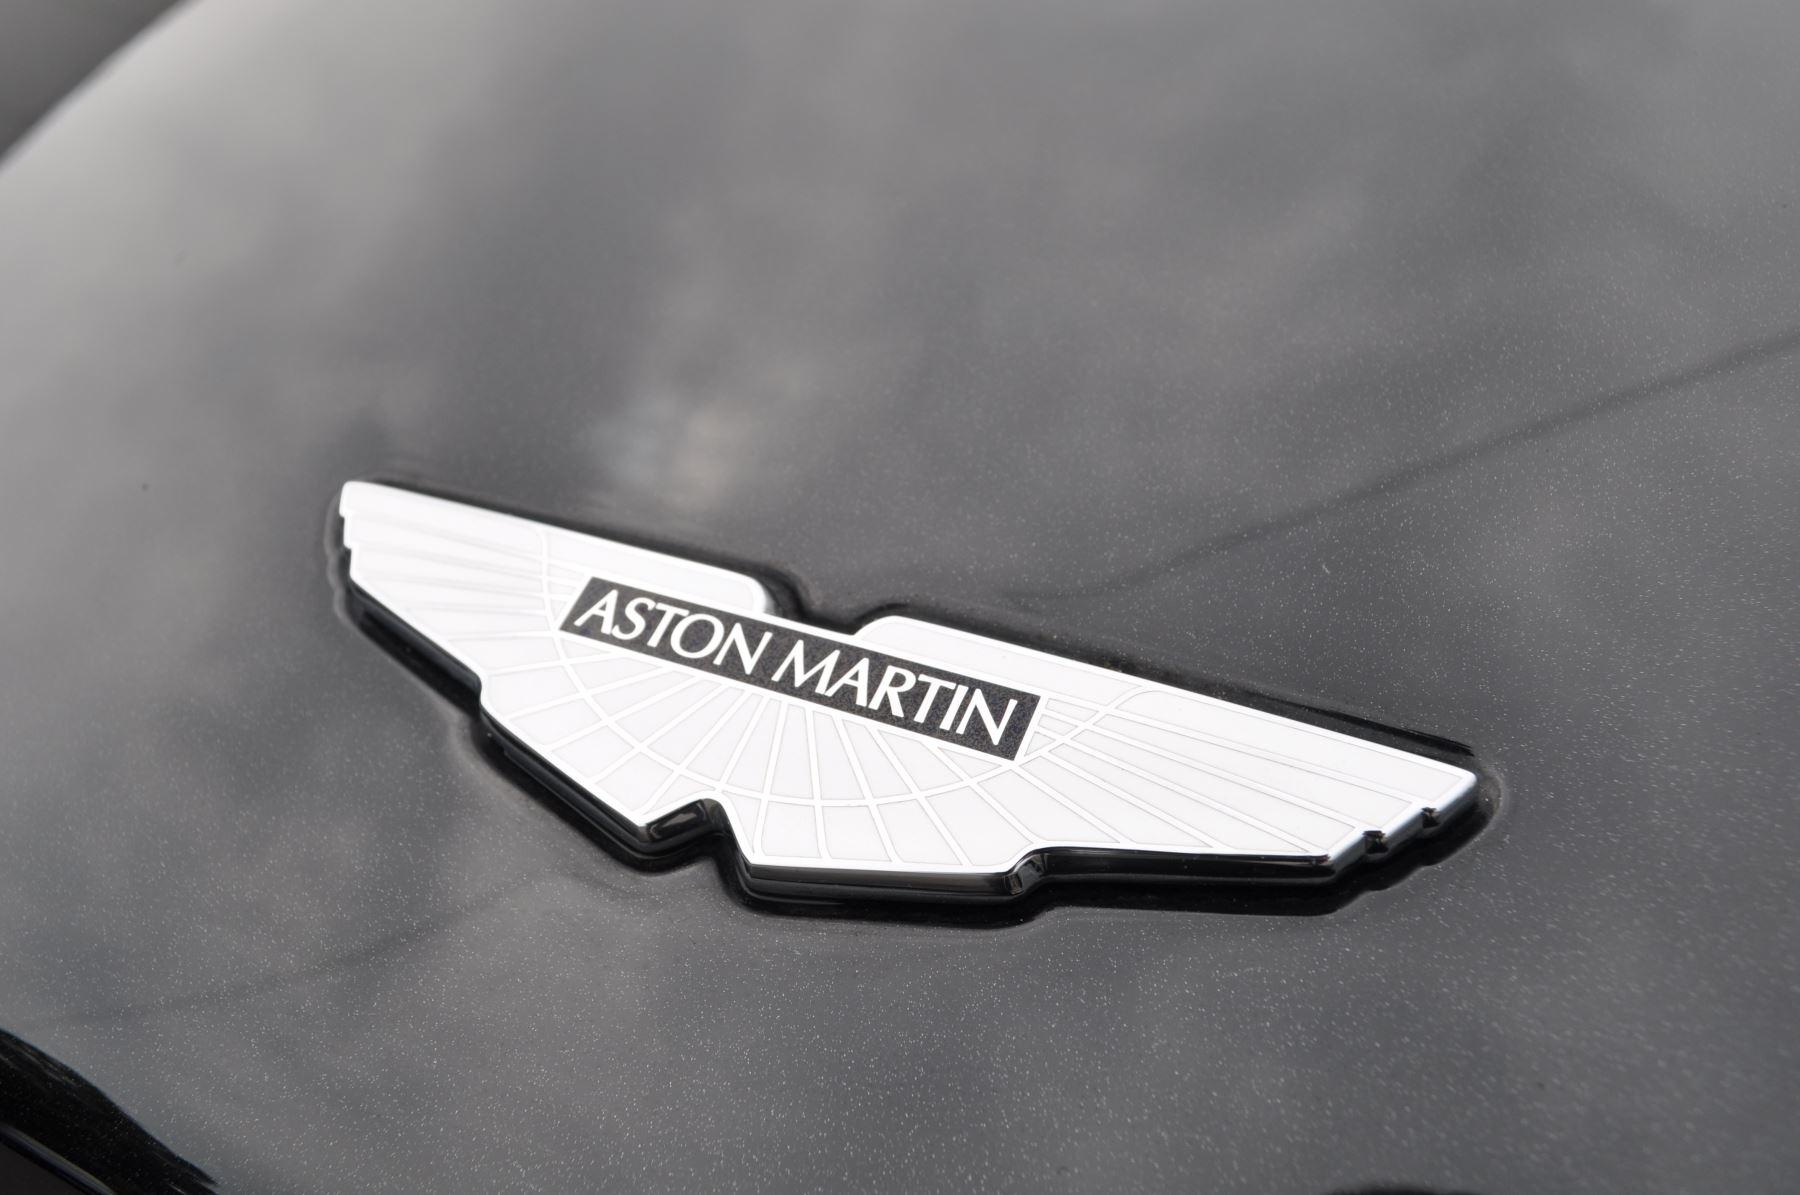 Aston Martin Vanquish S V12 [595] S 2+2 2dr Touchtronic image 45